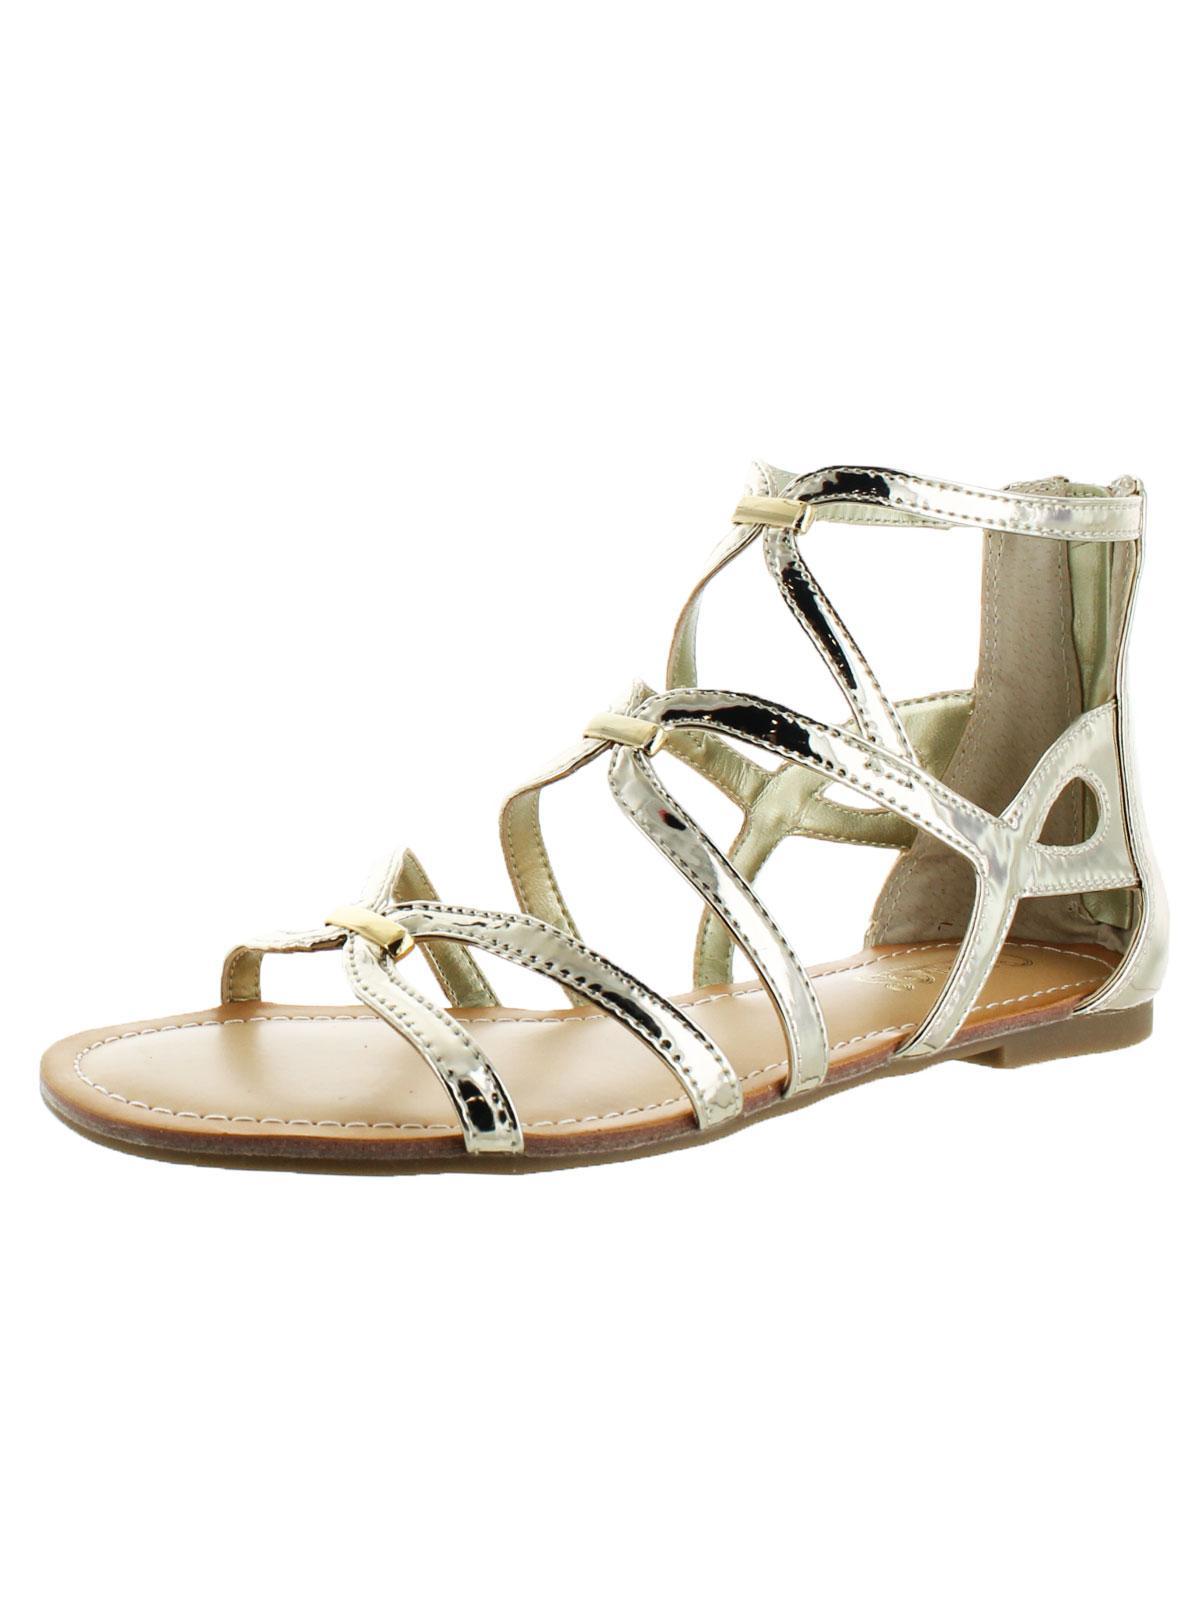 Carlos by Carlos Santana Womens Emma Open Toe Caged Gladiator Sandals